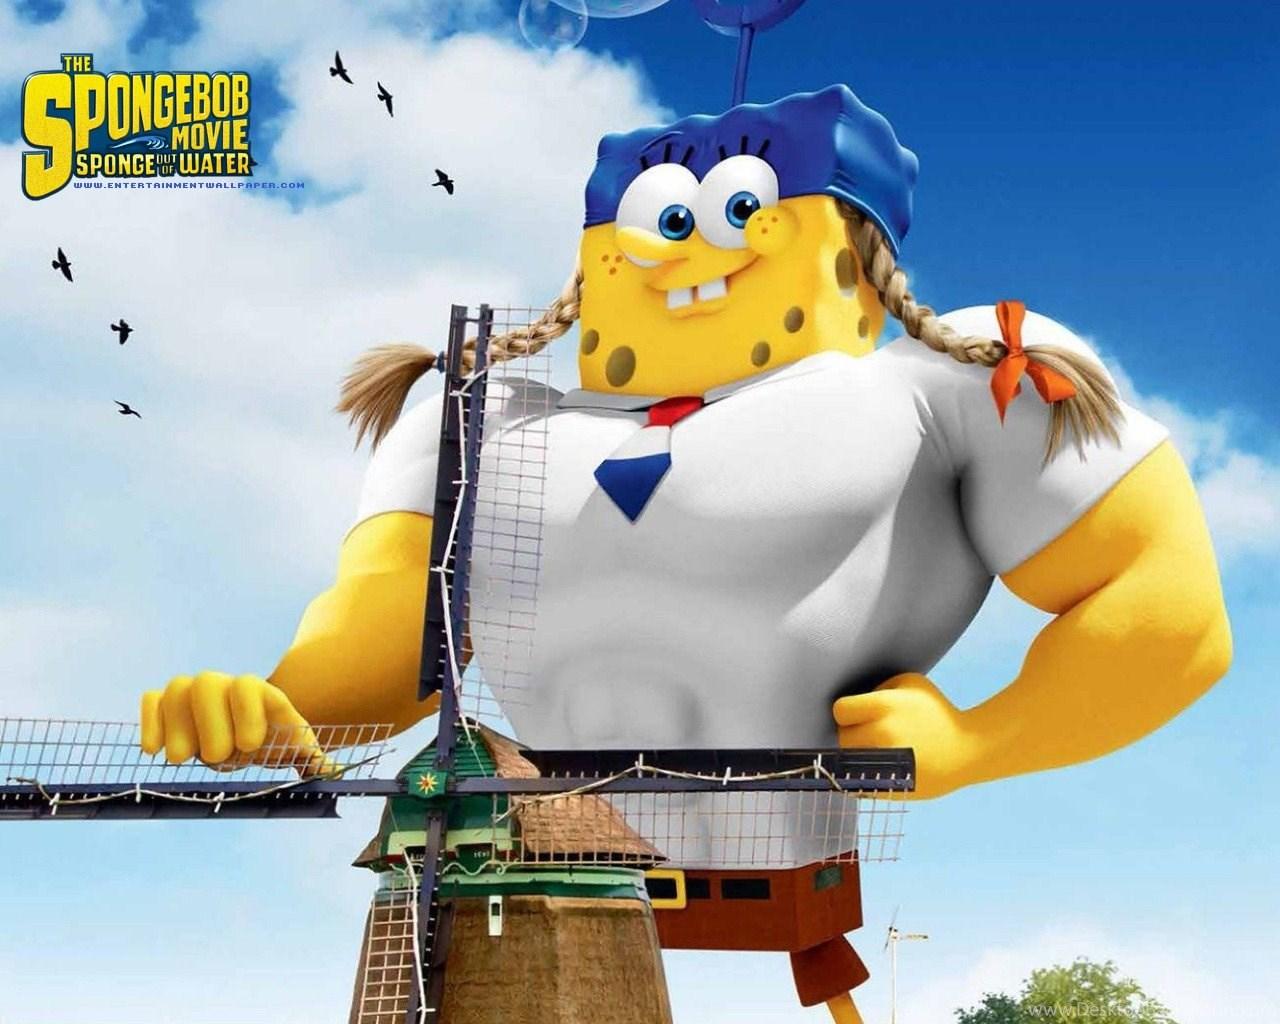 The Spongebob Movie Sponge Out Of Water Wallpapers Desktop Background